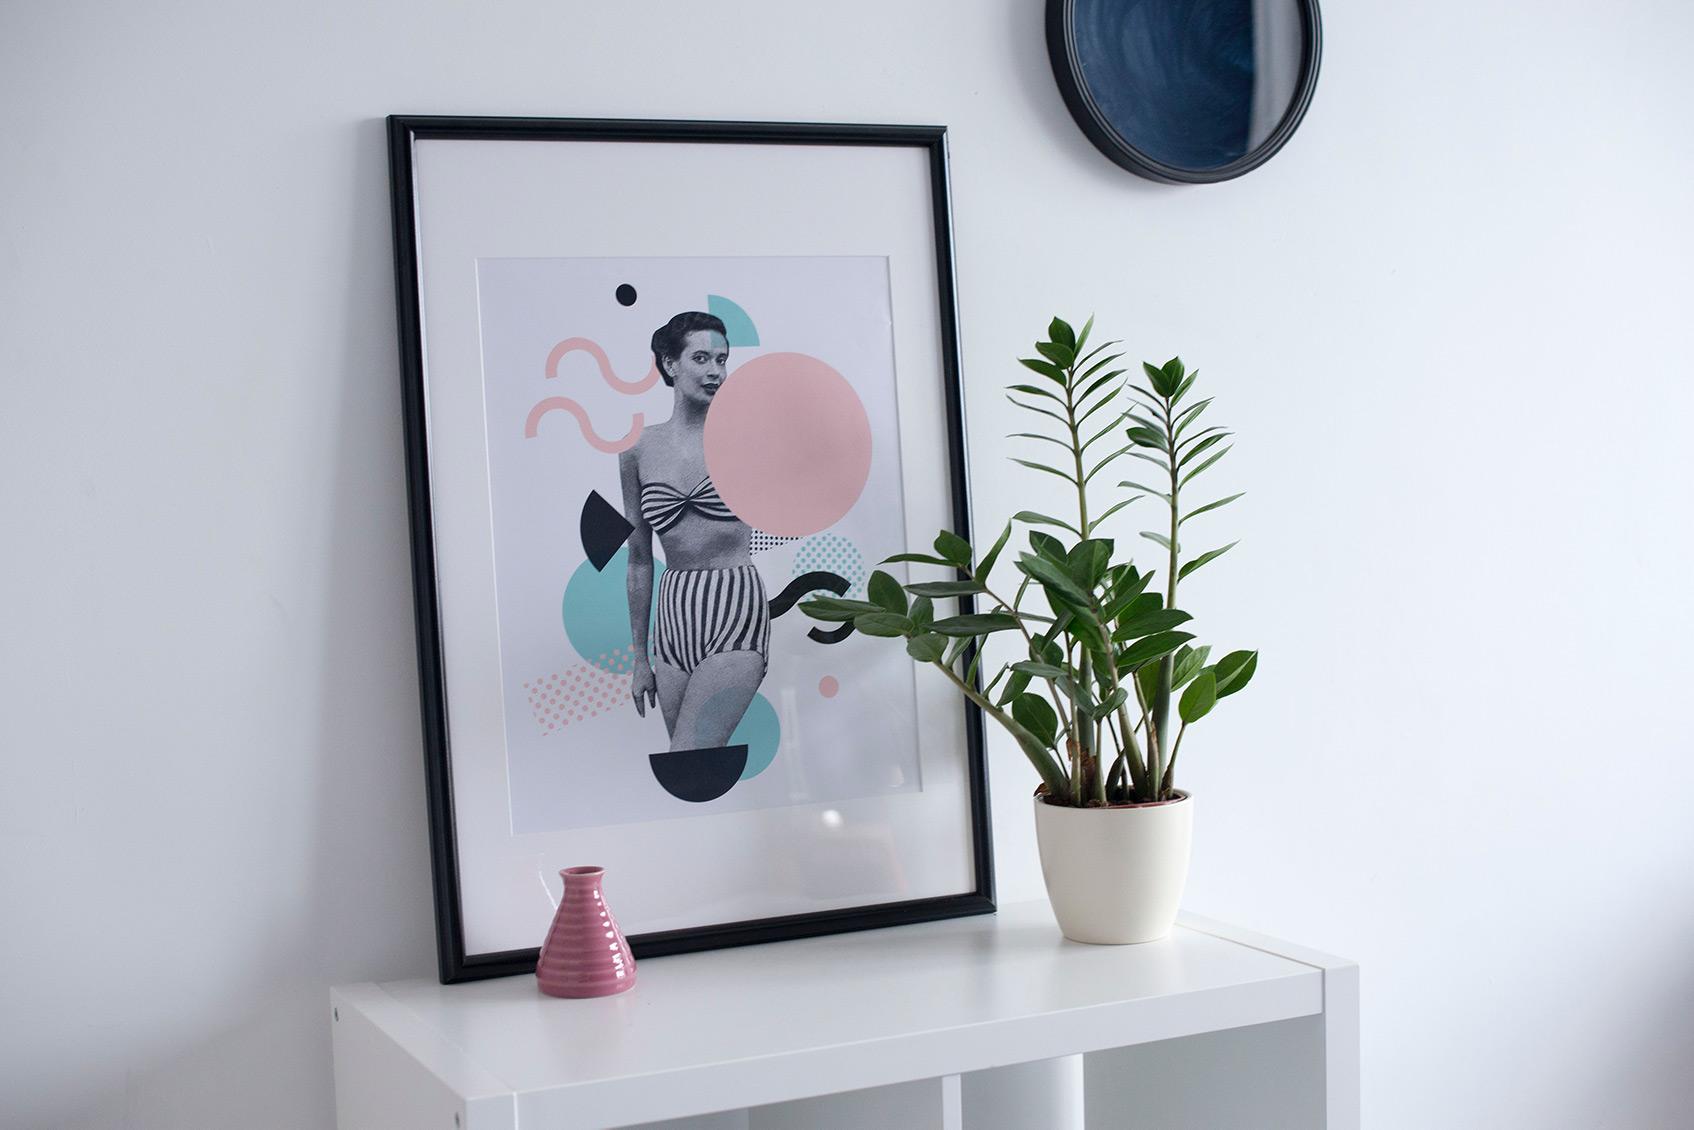 арт объекты для дома